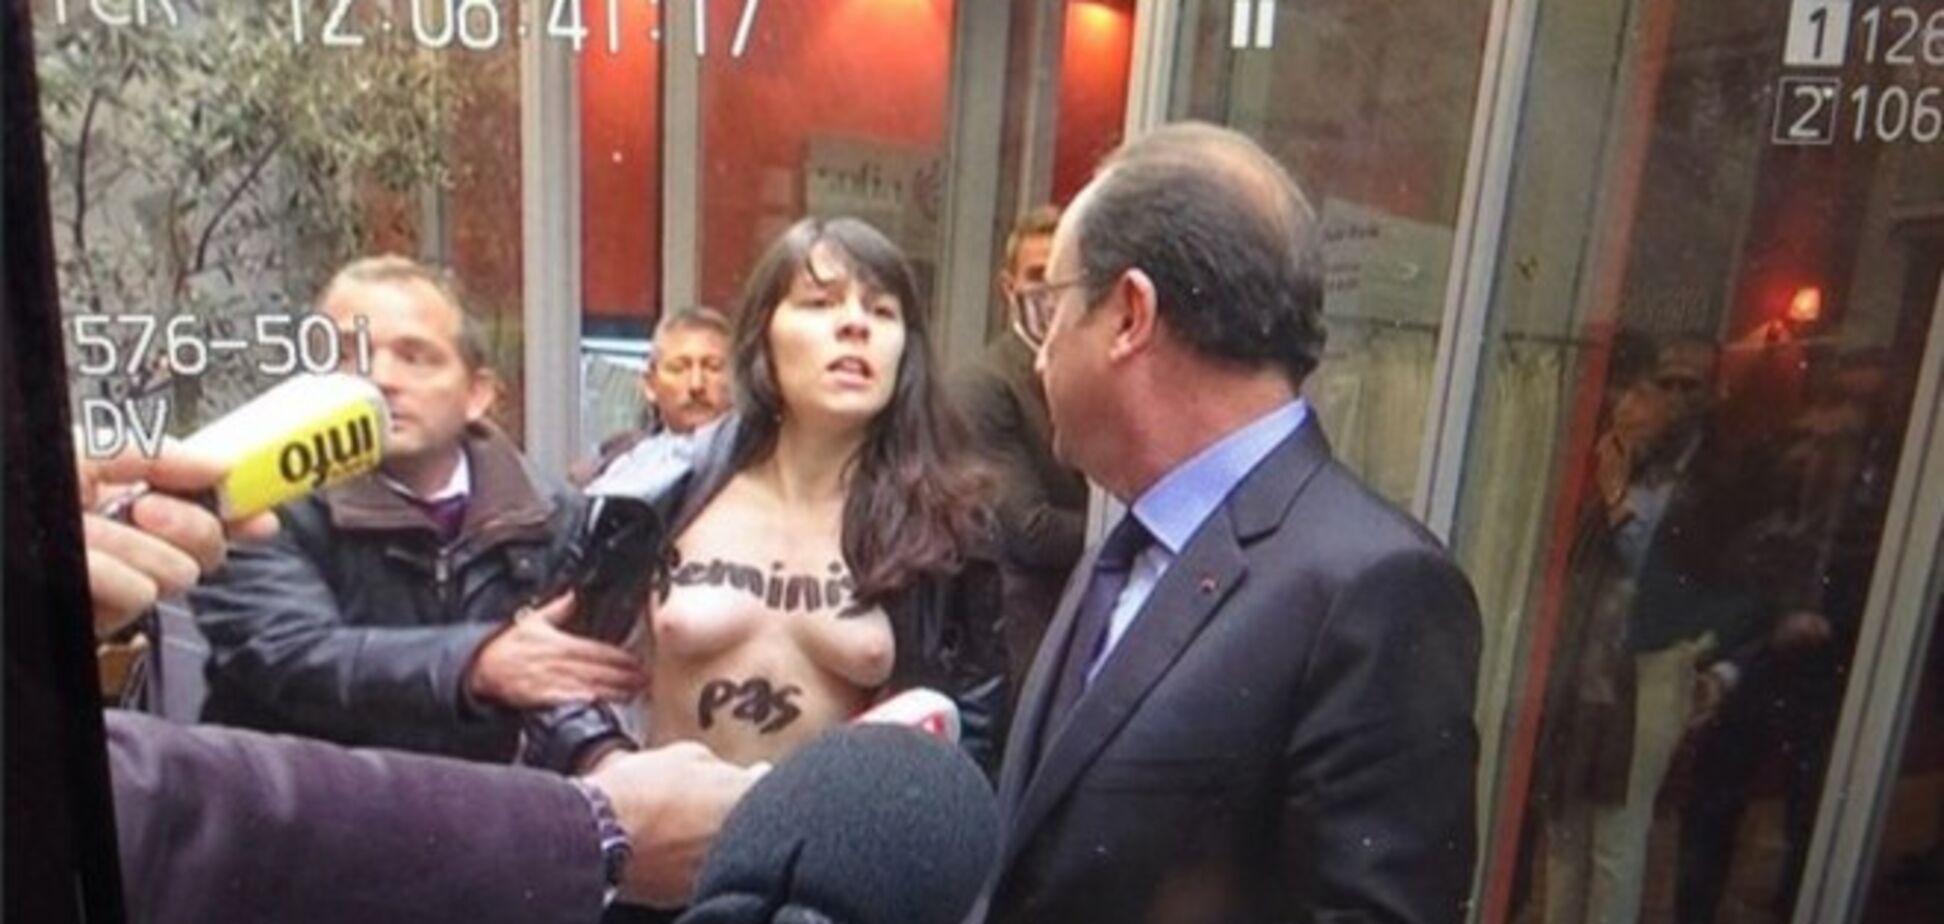 Активистка Femen разделась перед президентом Франции: опубликовано видео